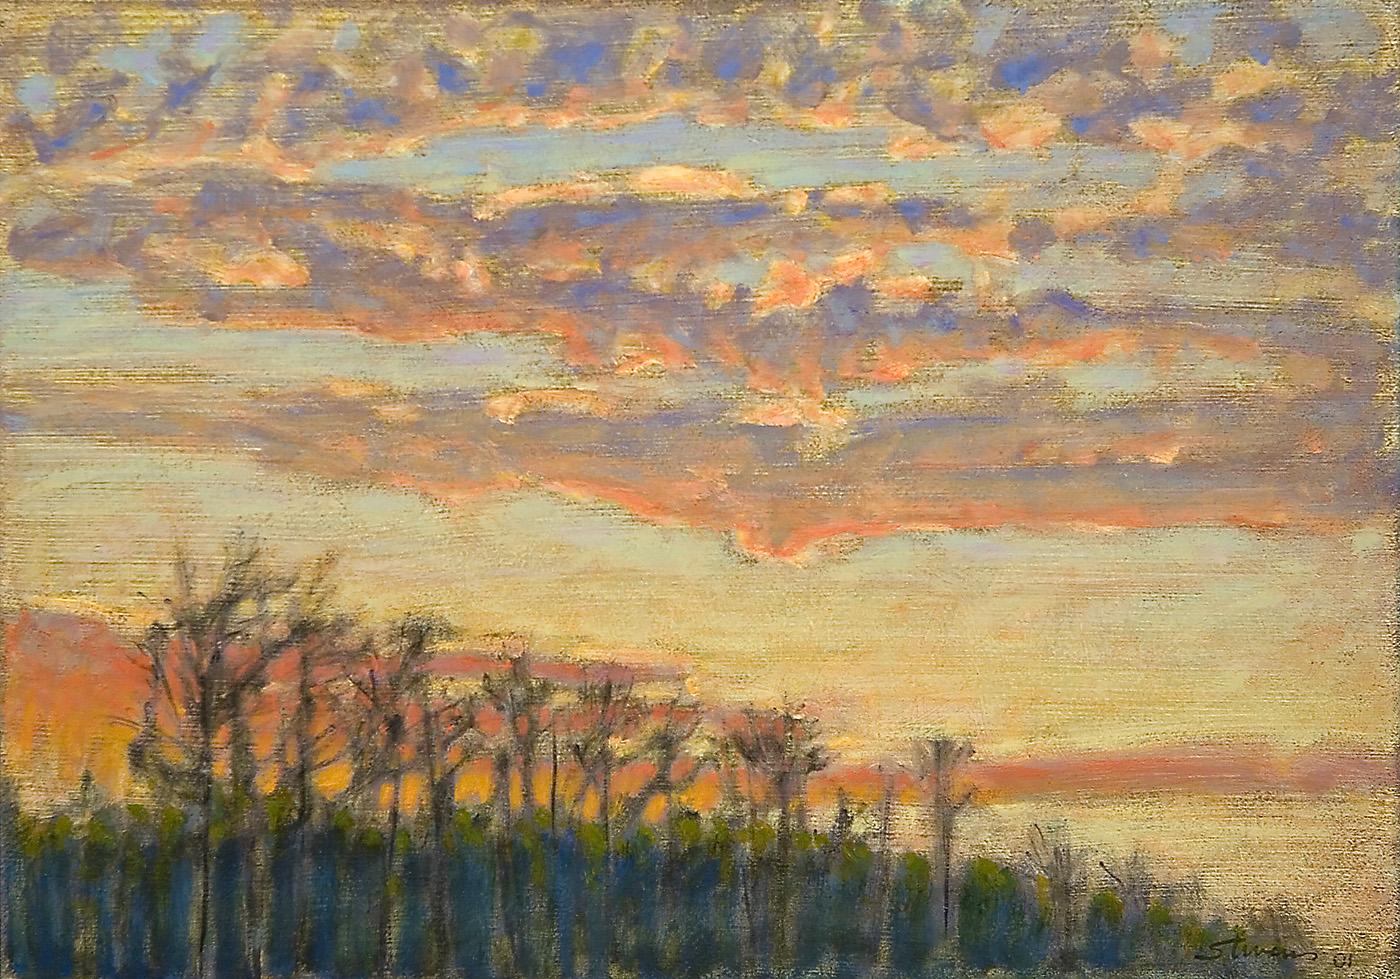 "Evening Sky   | oil on linen | 12 x 17"" | 2001"